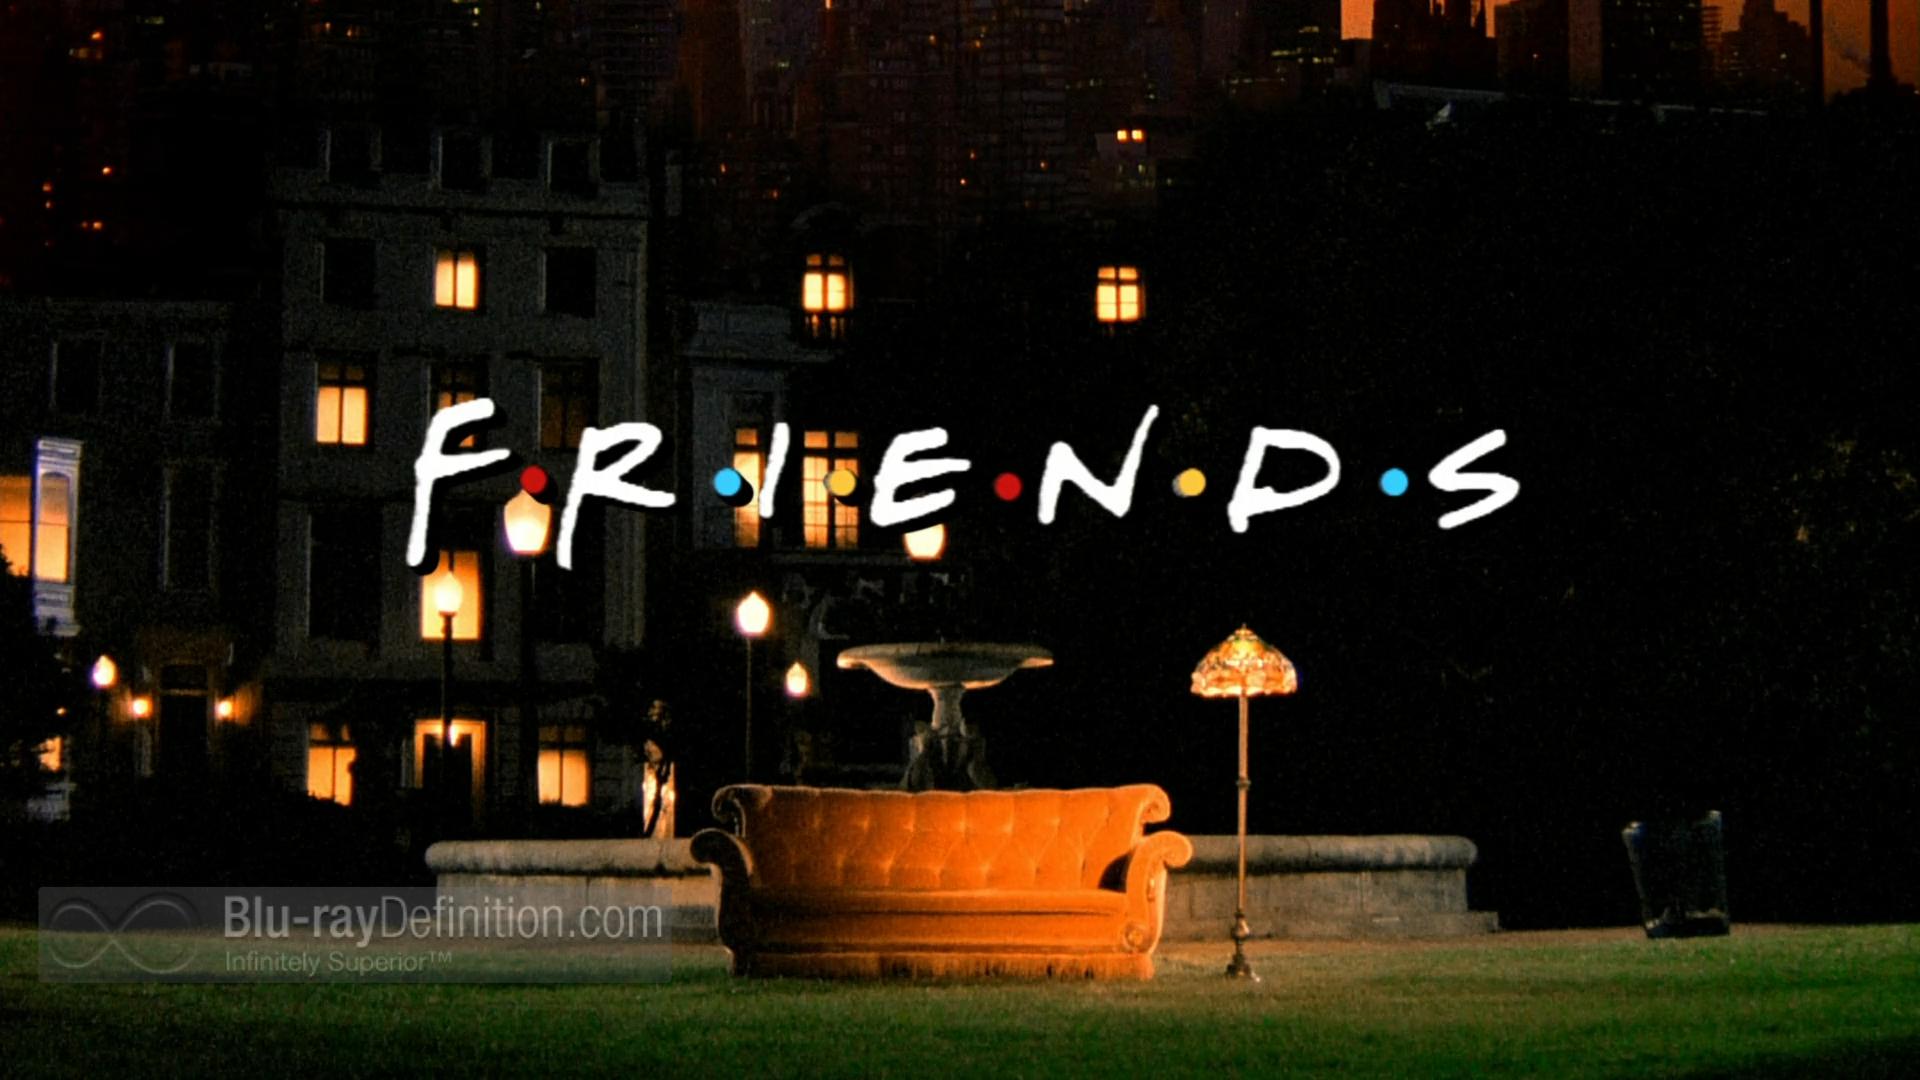 Friends Tv Show Wallpapers - WallpaperSafari